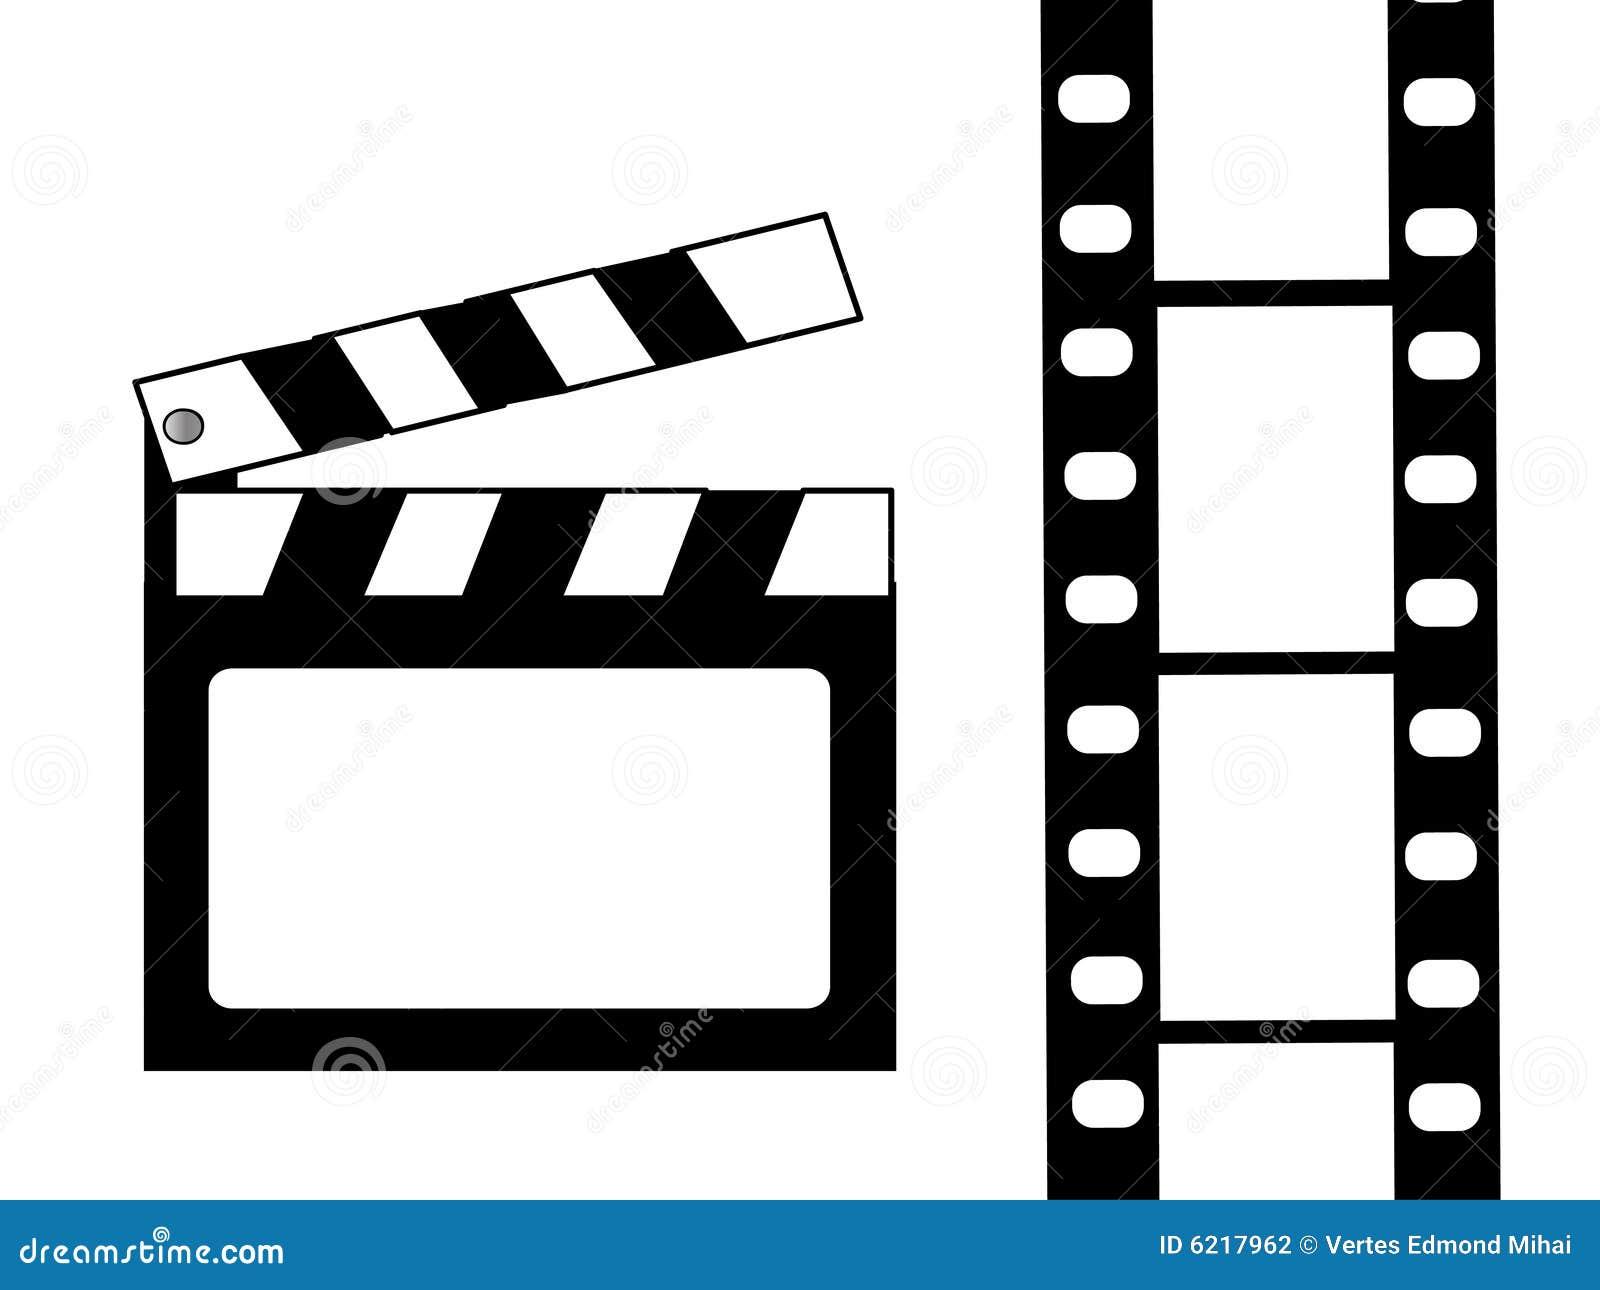 clapboard and film vector stock vector illustration of motion 6217962. Black Bedroom Furniture Sets. Home Design Ideas